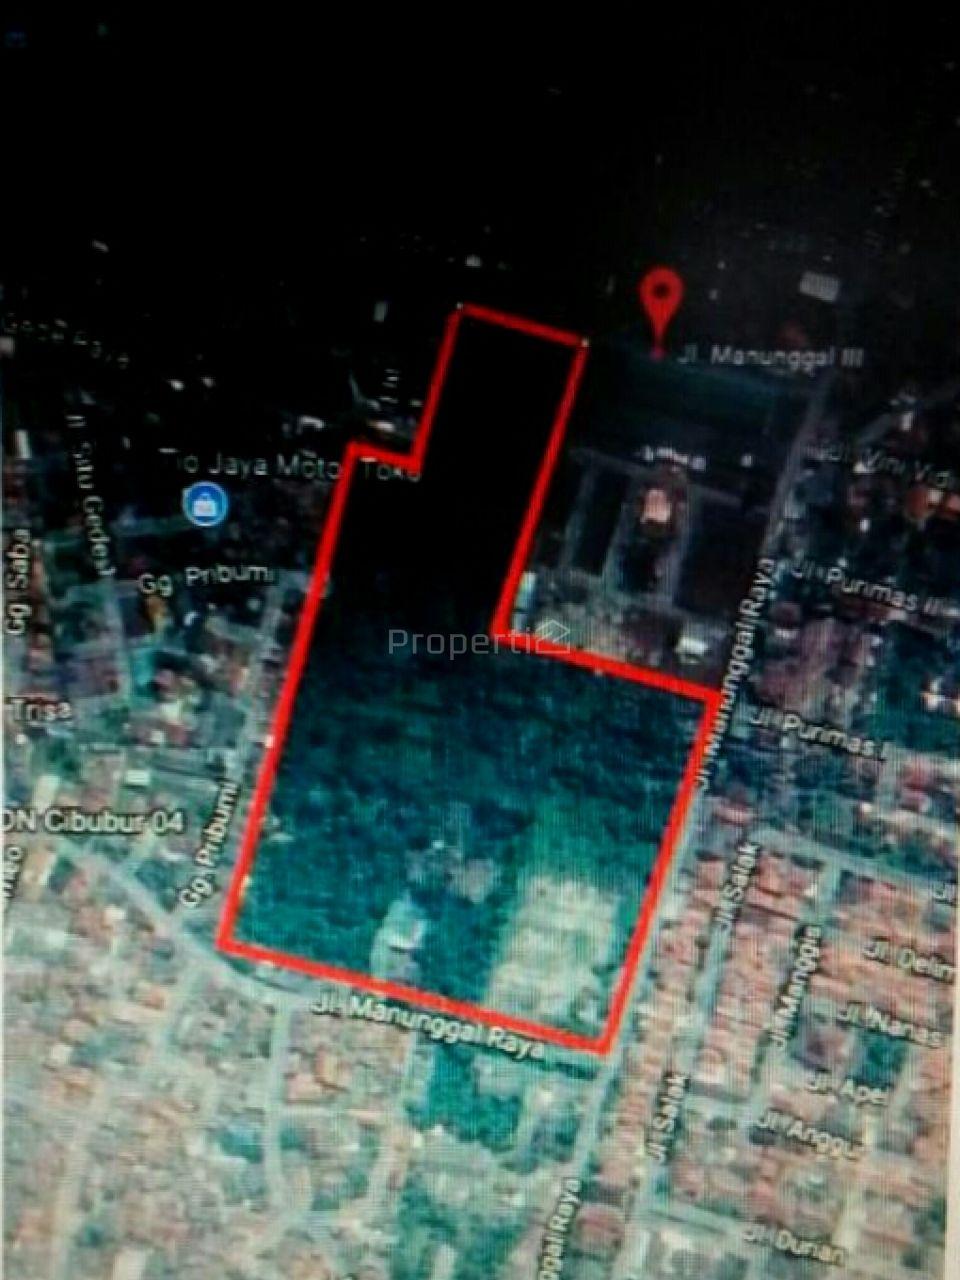 Flat Land 9.5 Ha in Cibubur, Jakarta Timur